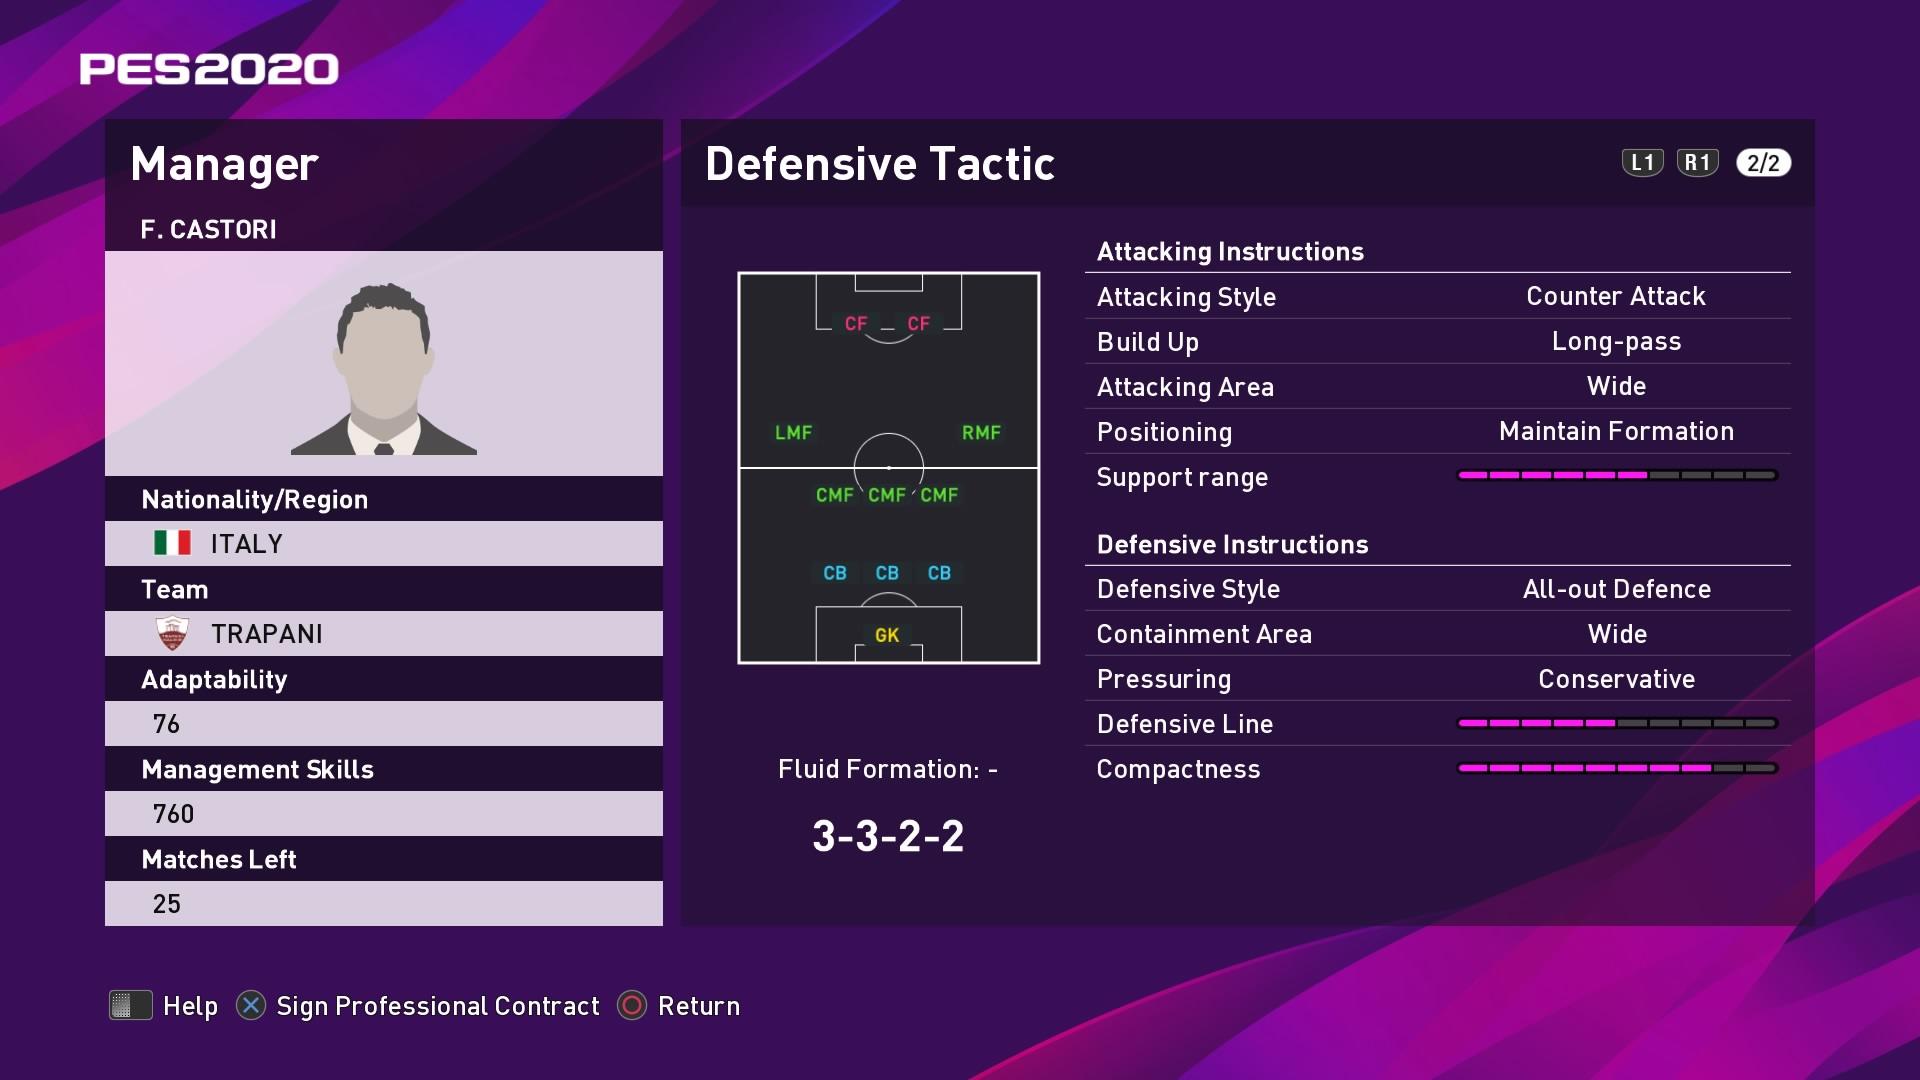 F. Castori (Fabrizio Castori) Defensive Tactic in PES 2020 myClub